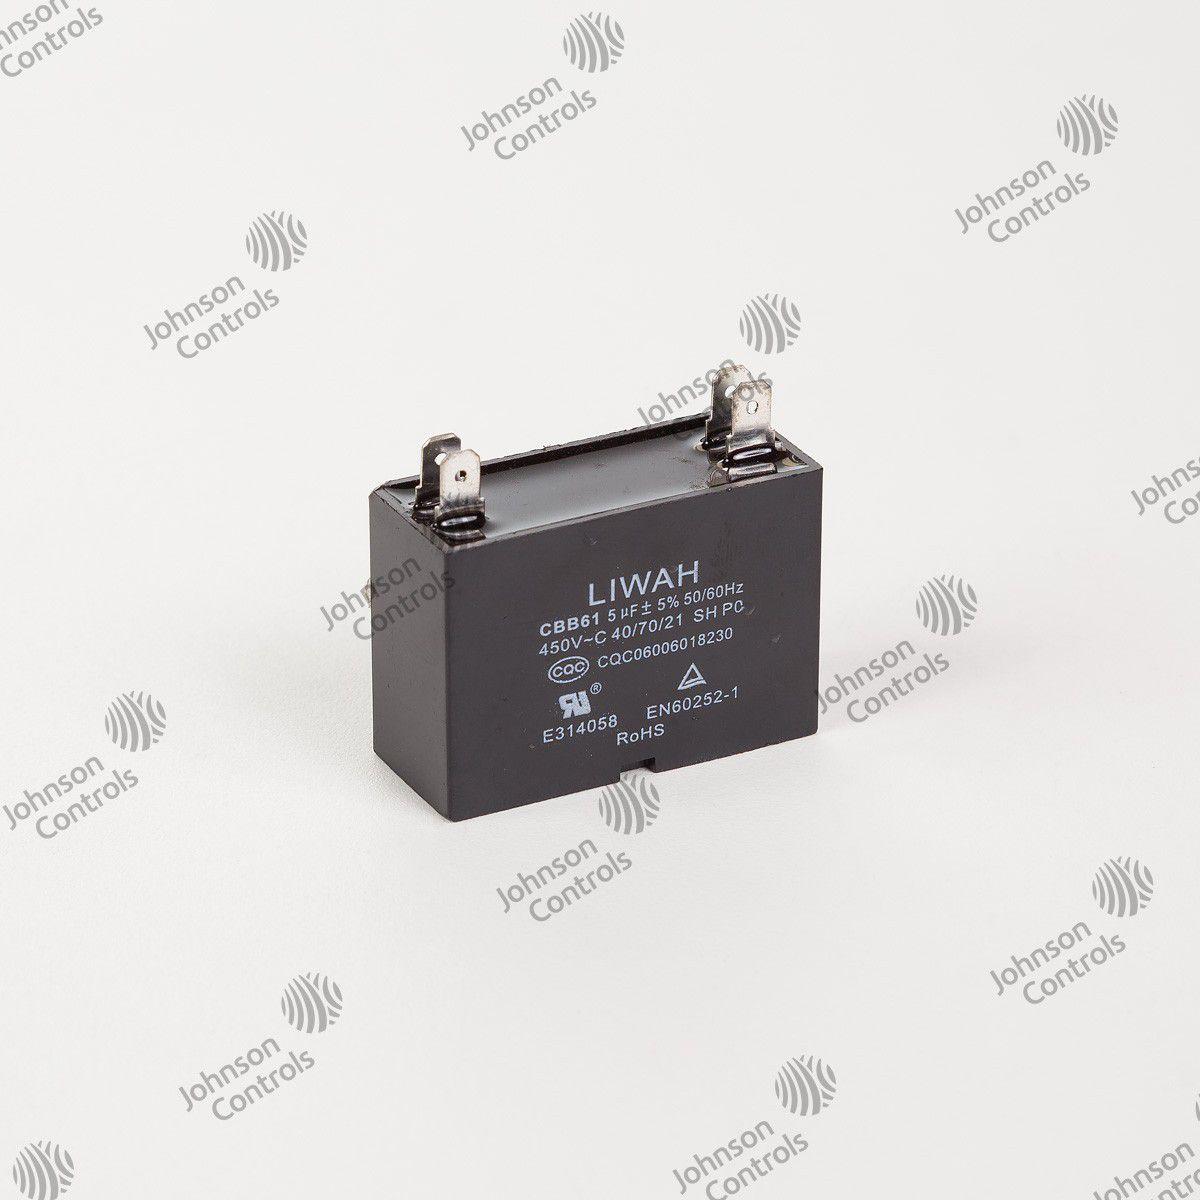 CAPACITOR 5uf 50/60Hz 450V P0 - CF0048037